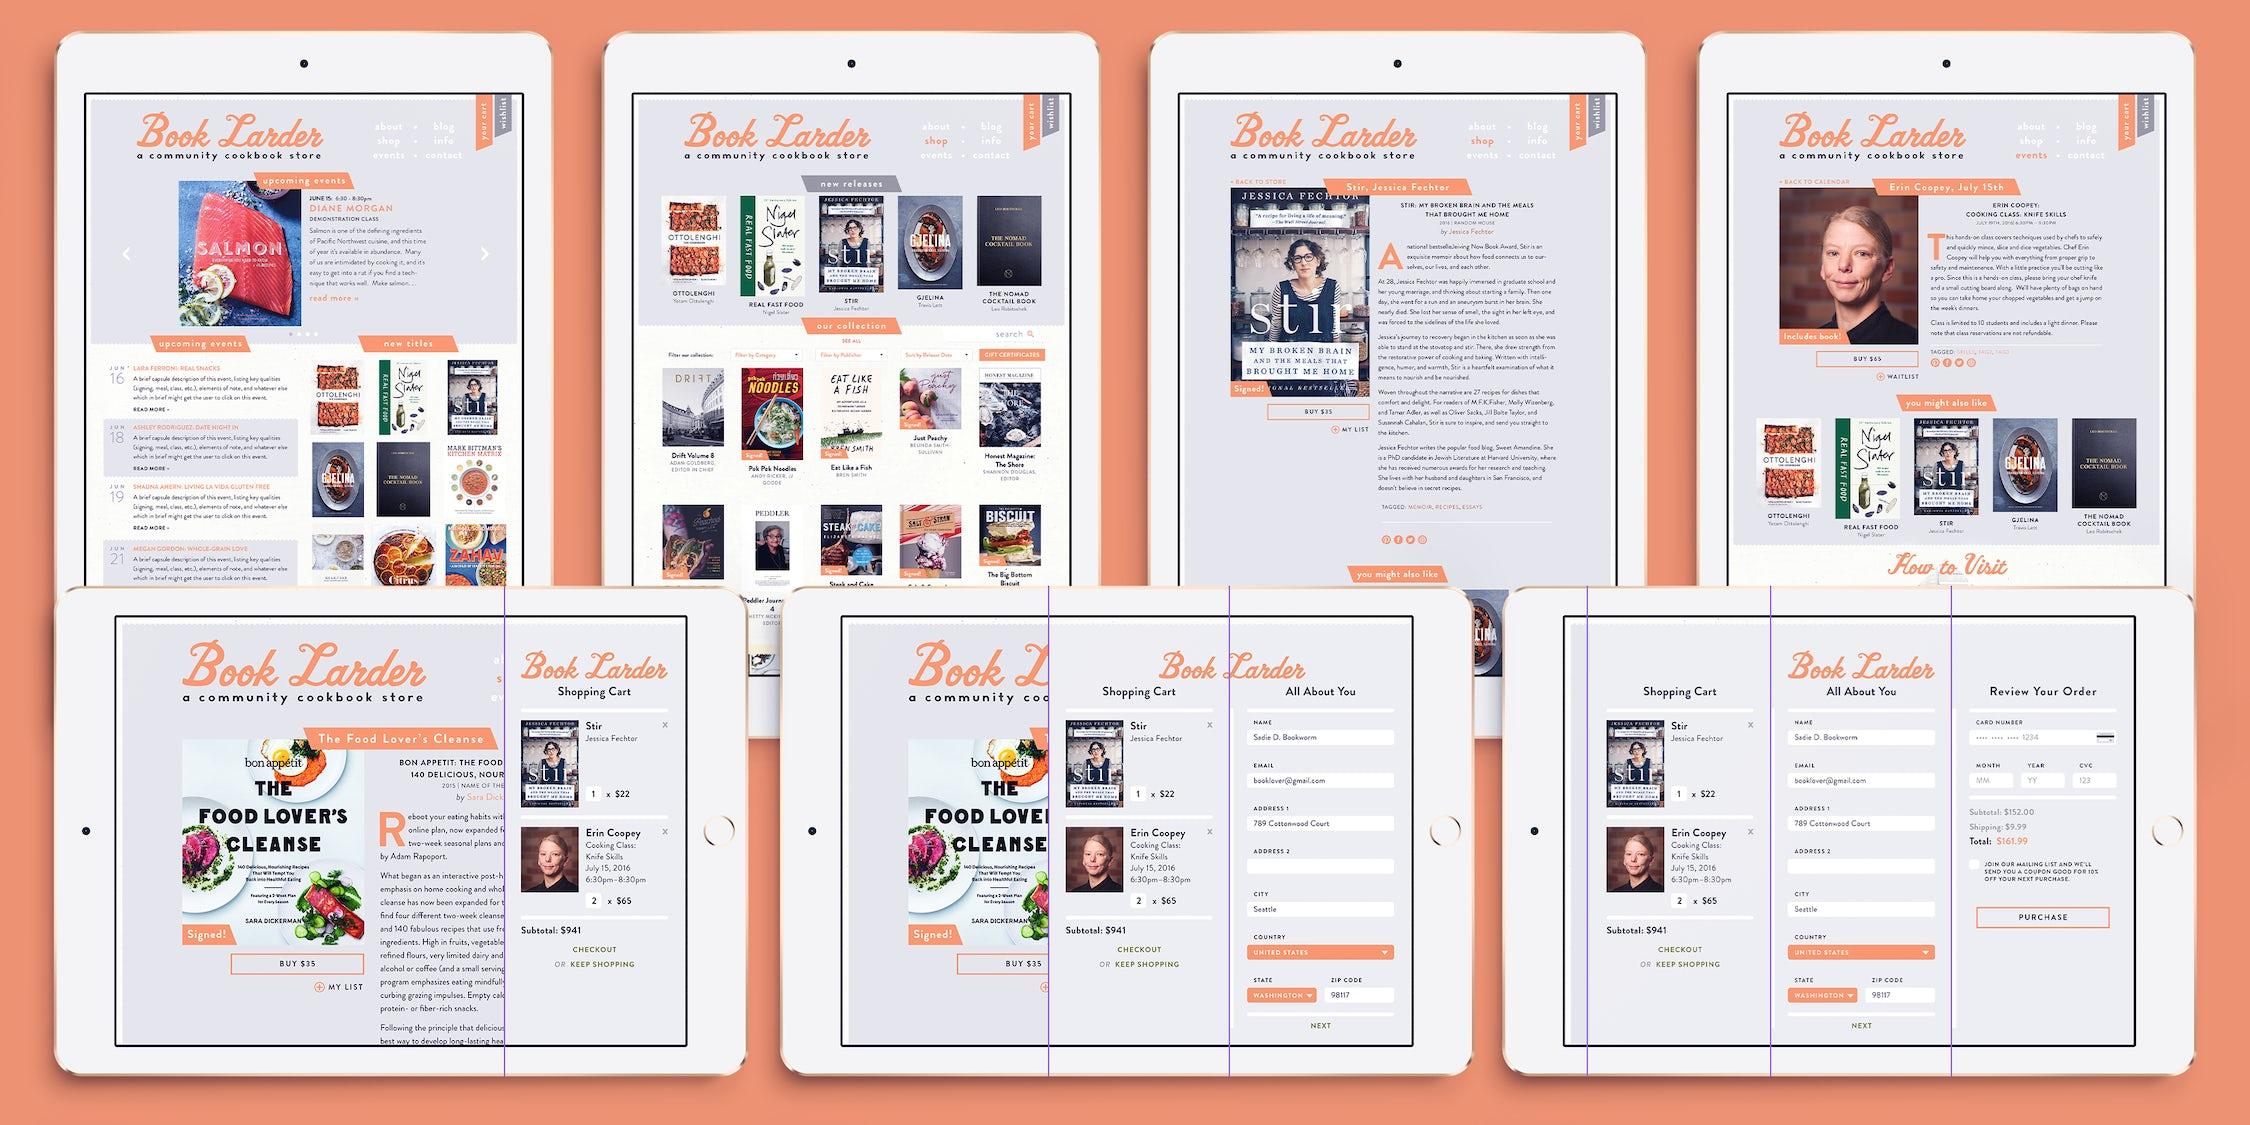 Book Larder's 2020 UX designs